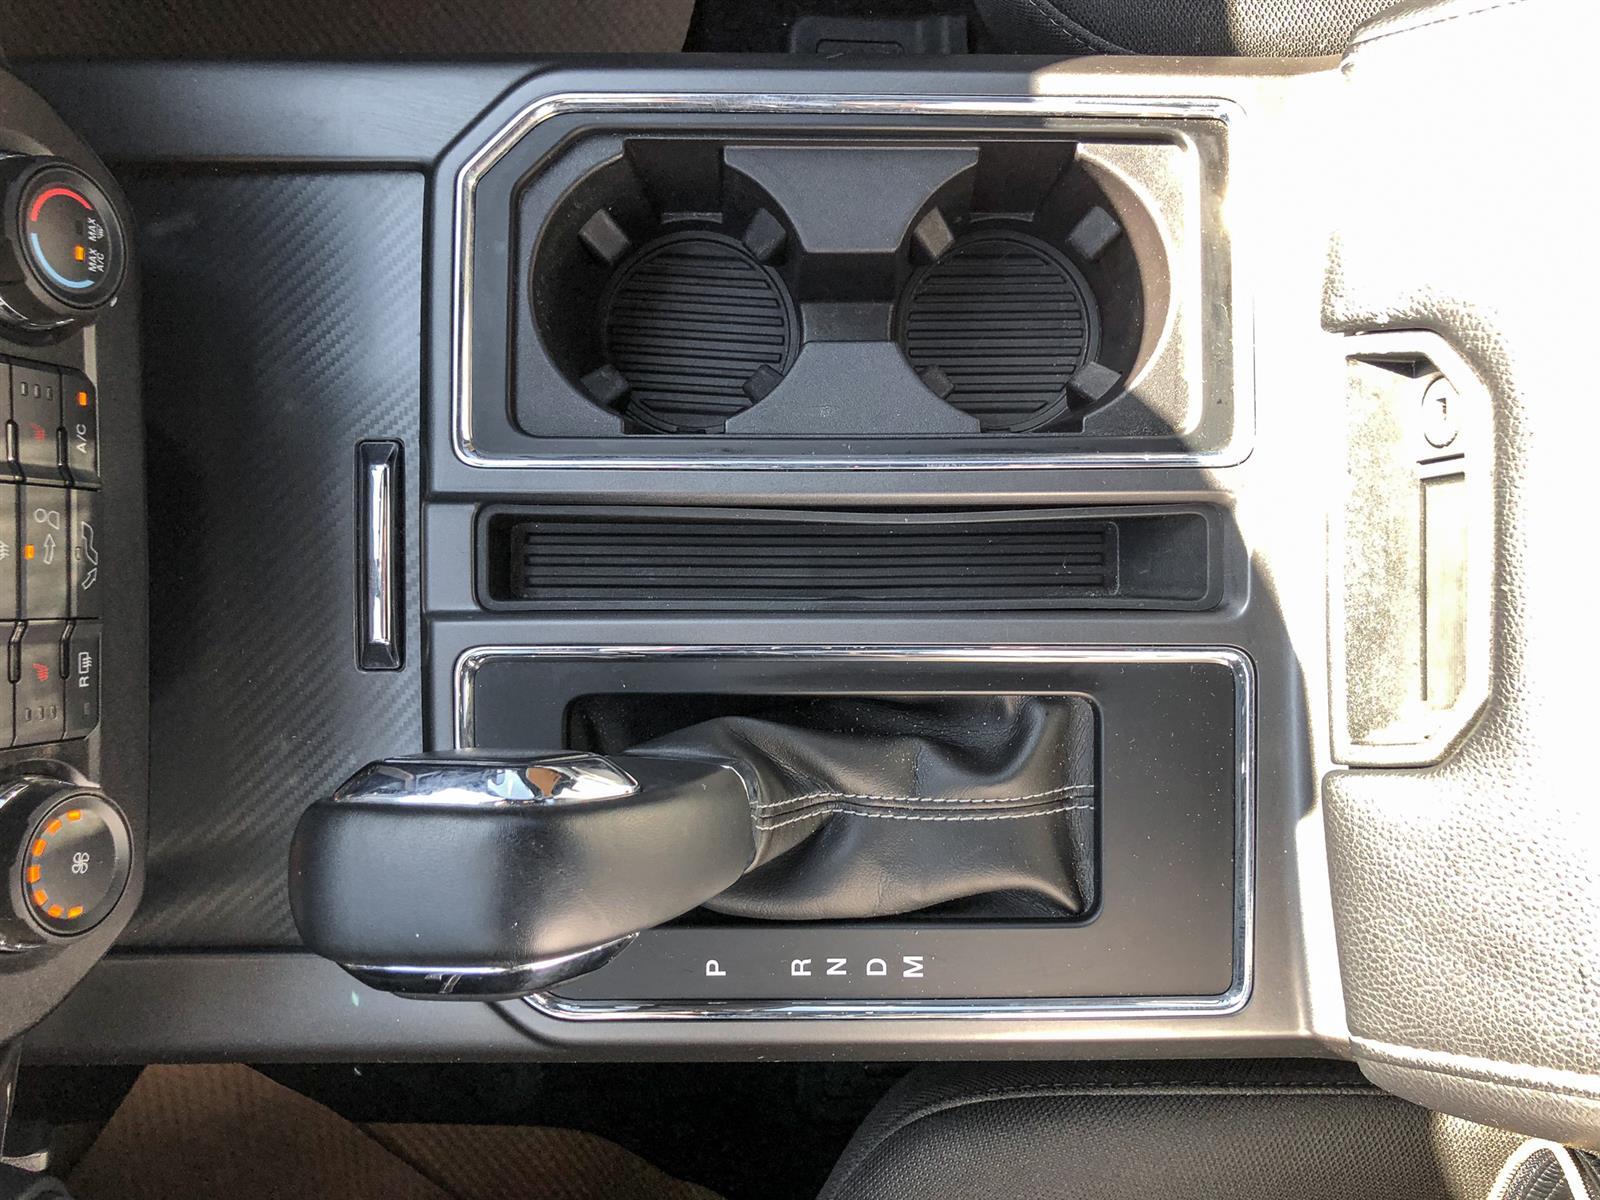 2019 Ford F-150 XLT | 3.5L V6 | 4X4 | REAR CAMERA | REMOTE STARTER